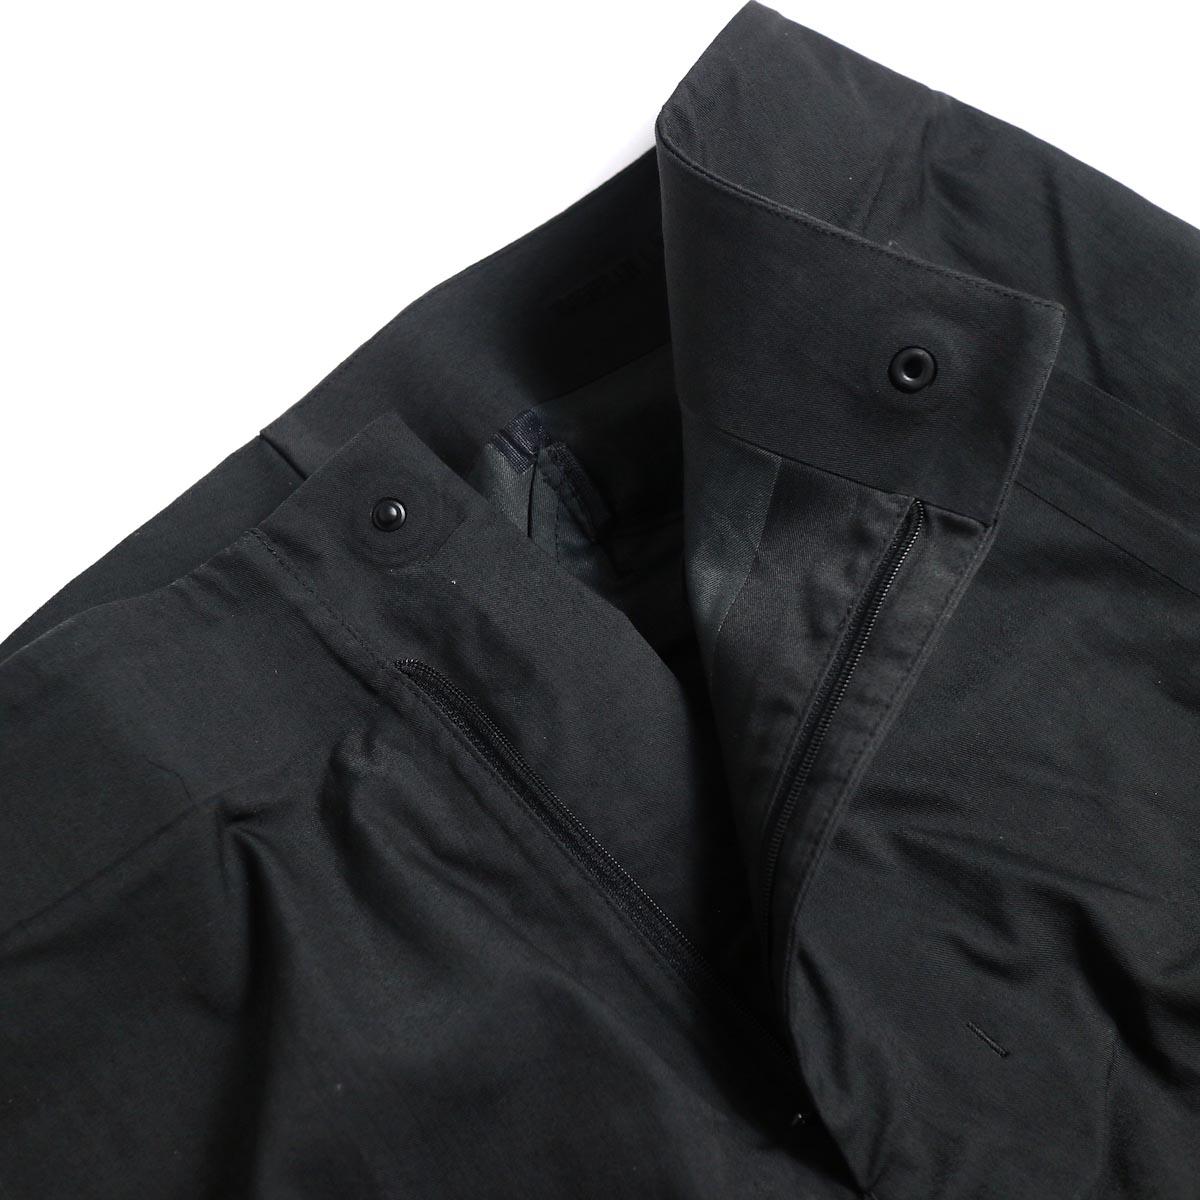 DESCENTE ALLTERAIN / Boa Long Pants Tapered Fit -Black ファスナー